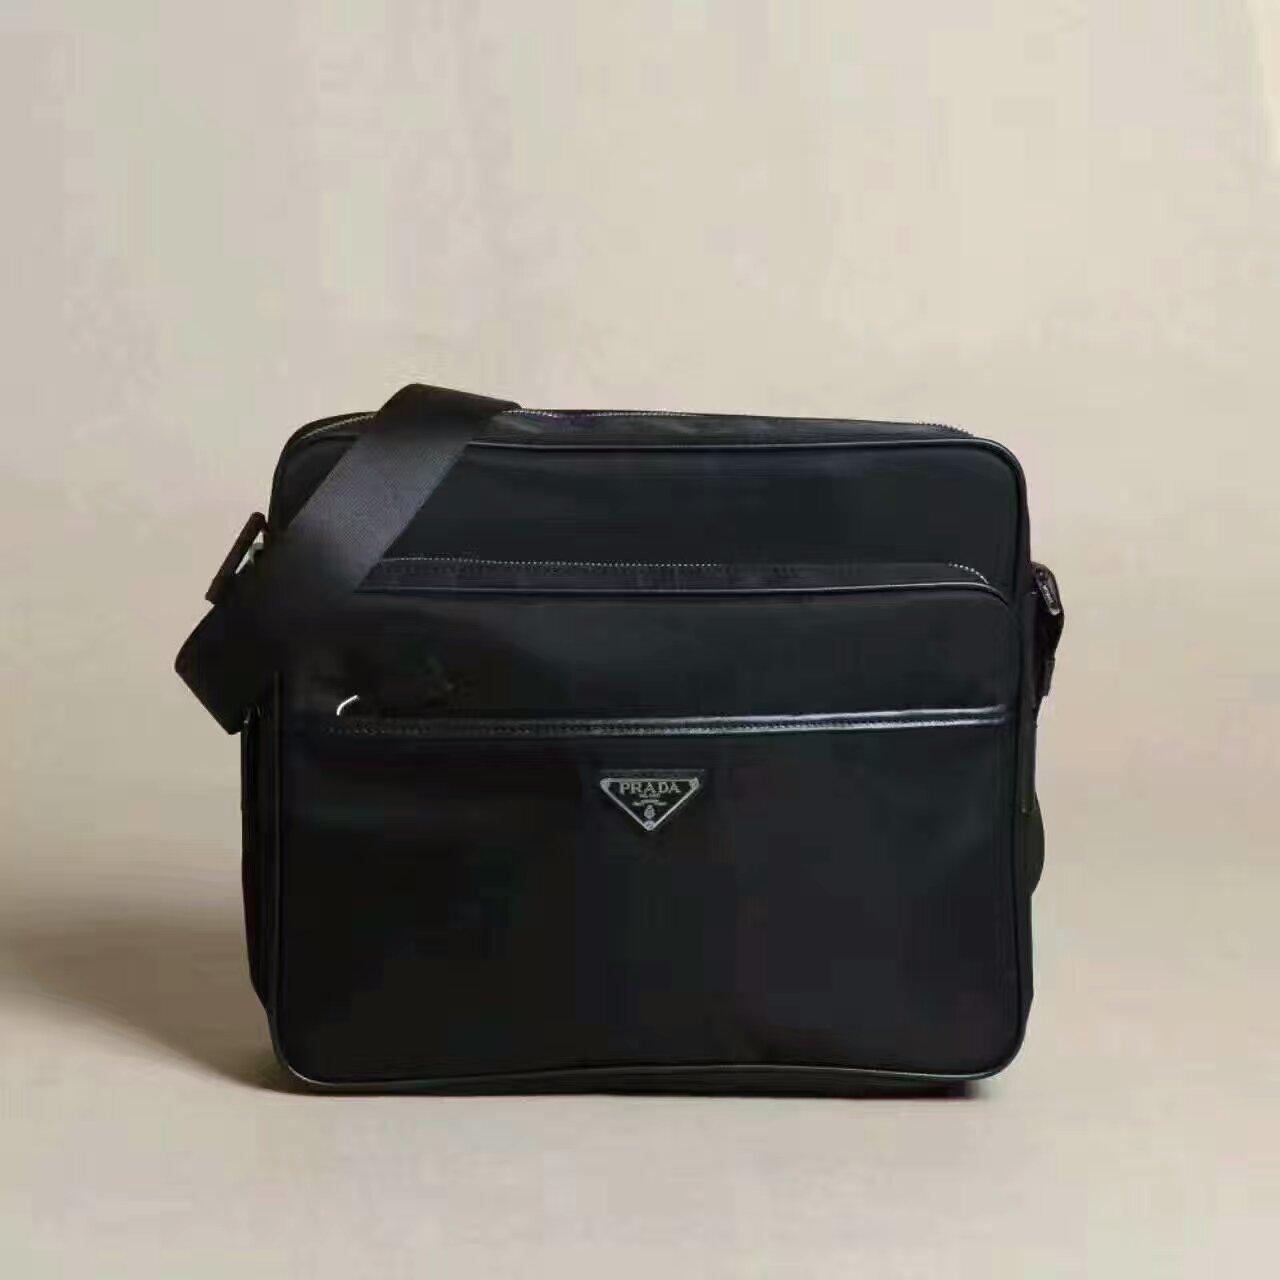 b32b0a02b5572d Prada Men's Canvas Crossbody Bag 1028 Black [RH0698] : Buy replica ...